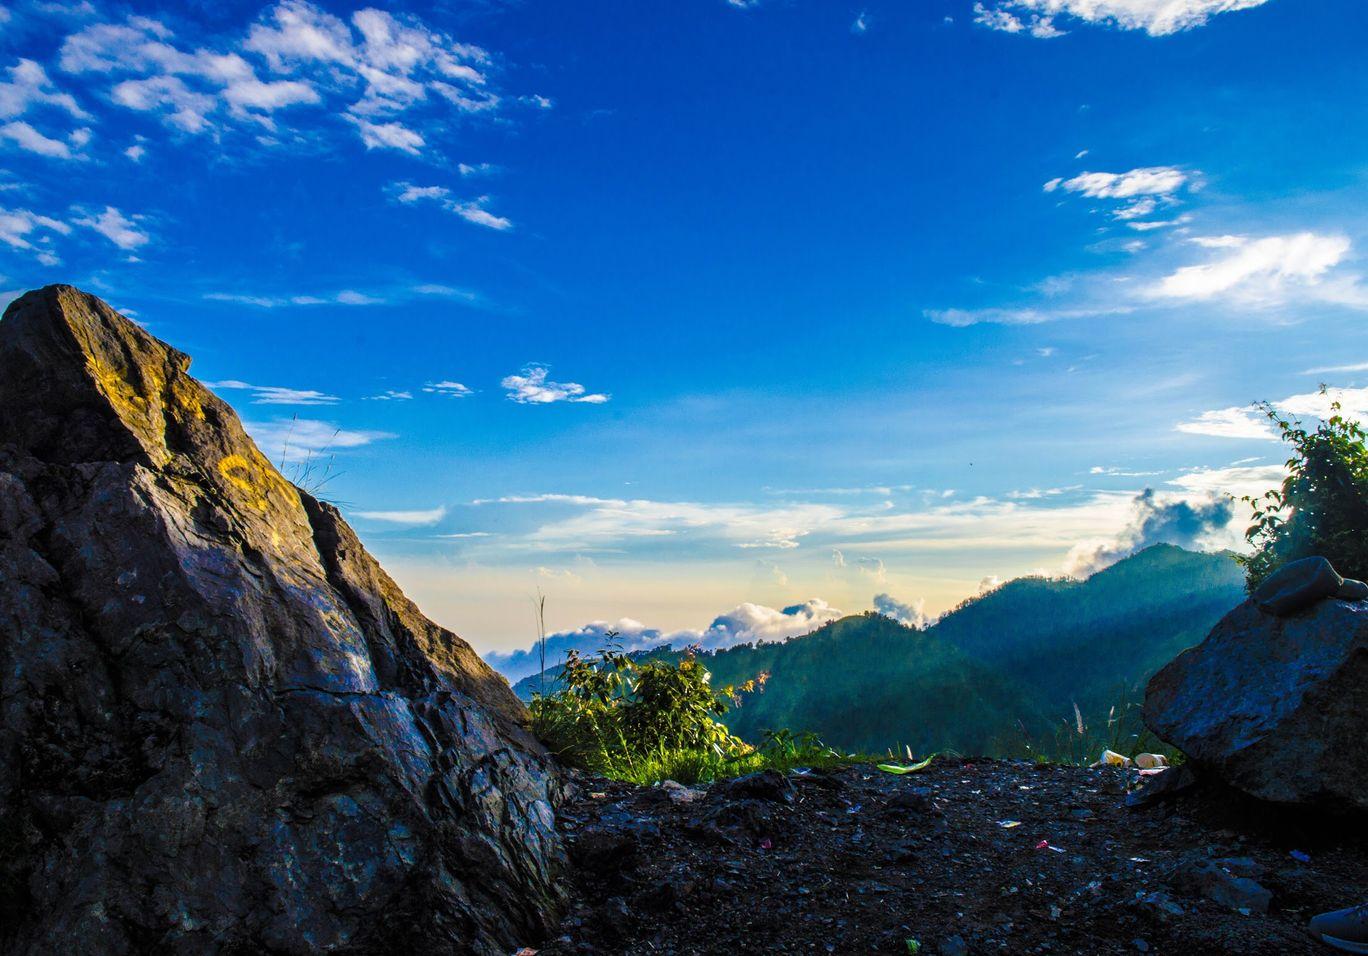 Photo of Nainital By Prateek Khatri